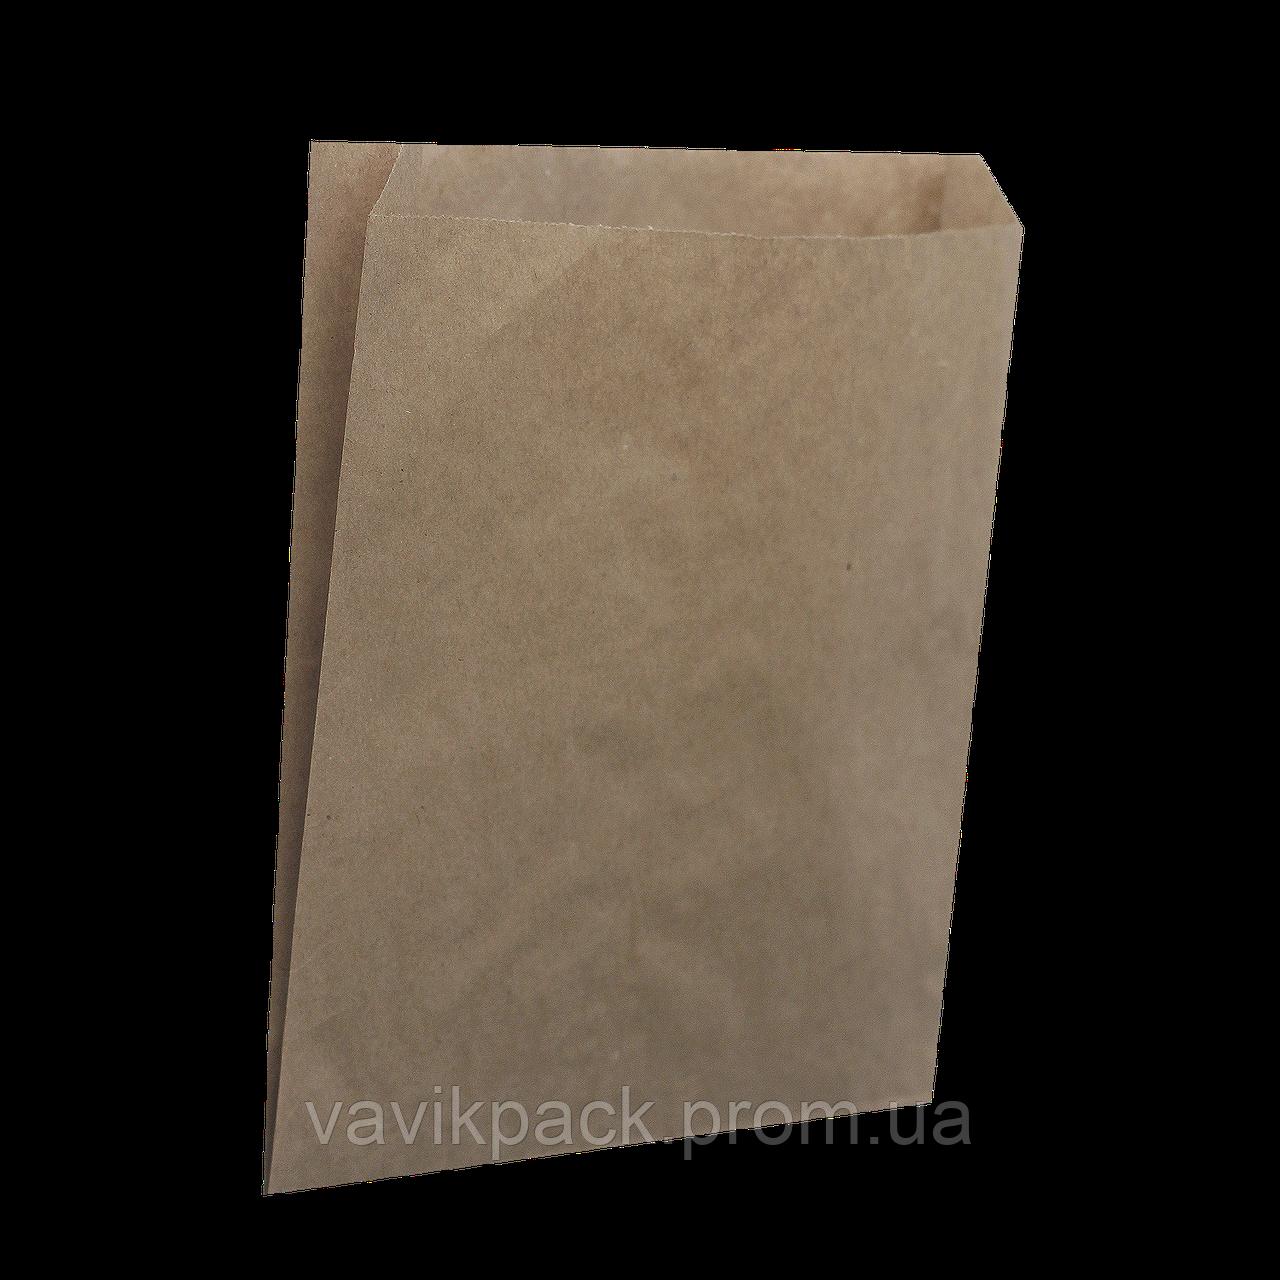 Пакет (120*40*100 мм)   Крафт импорт  41г/м2  жиростойкий